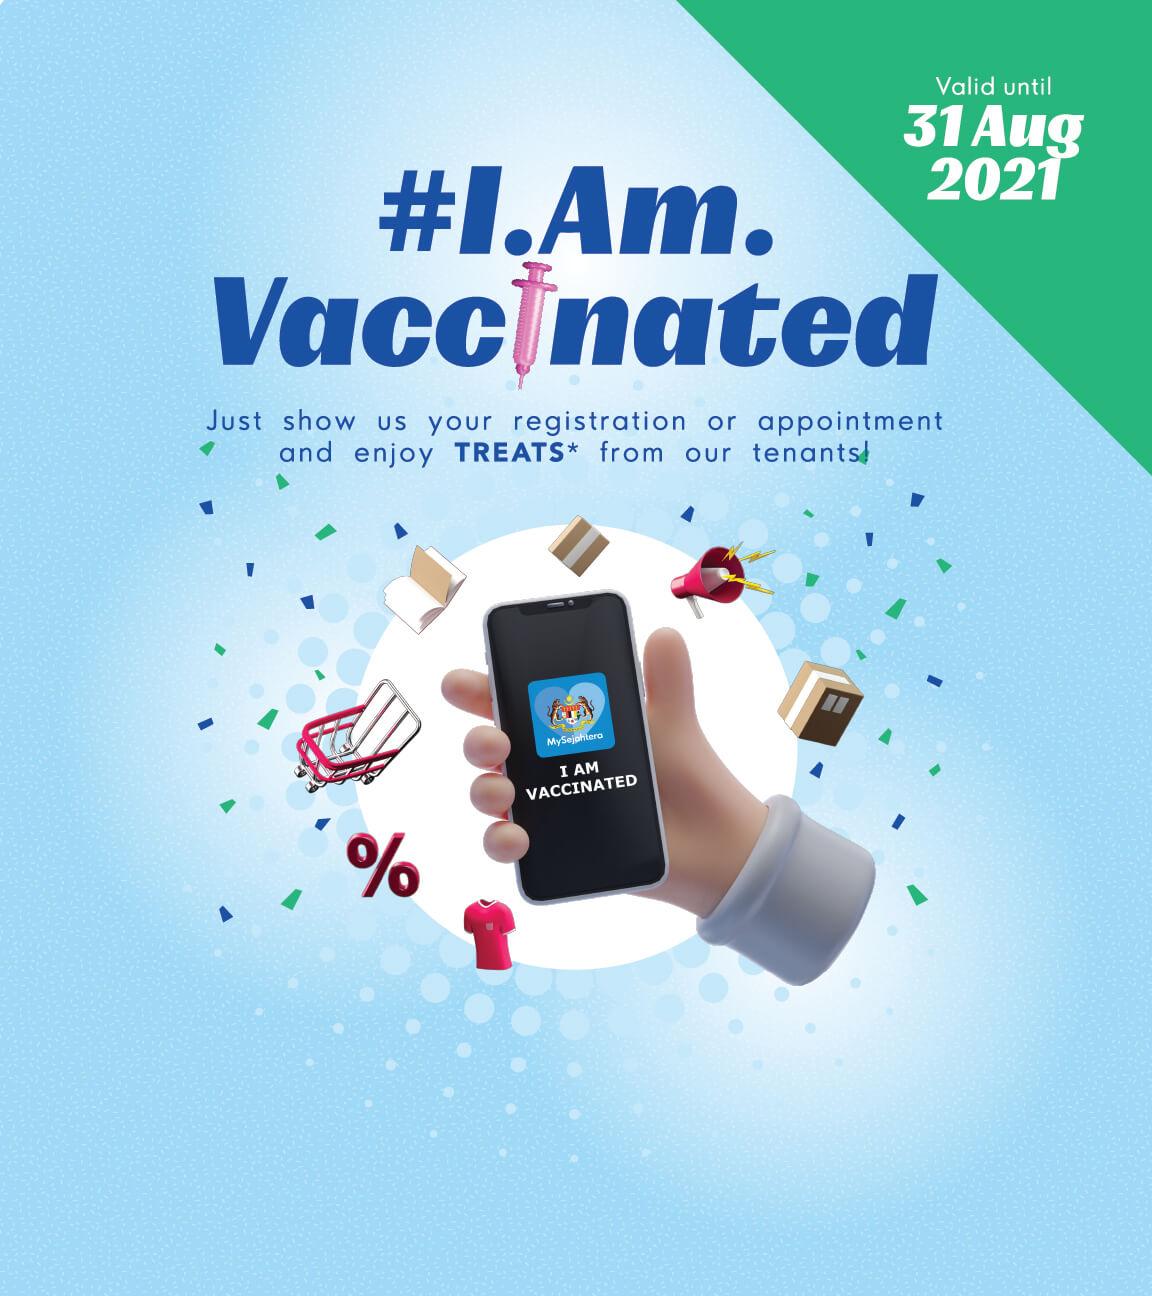 #IAmVaccinated